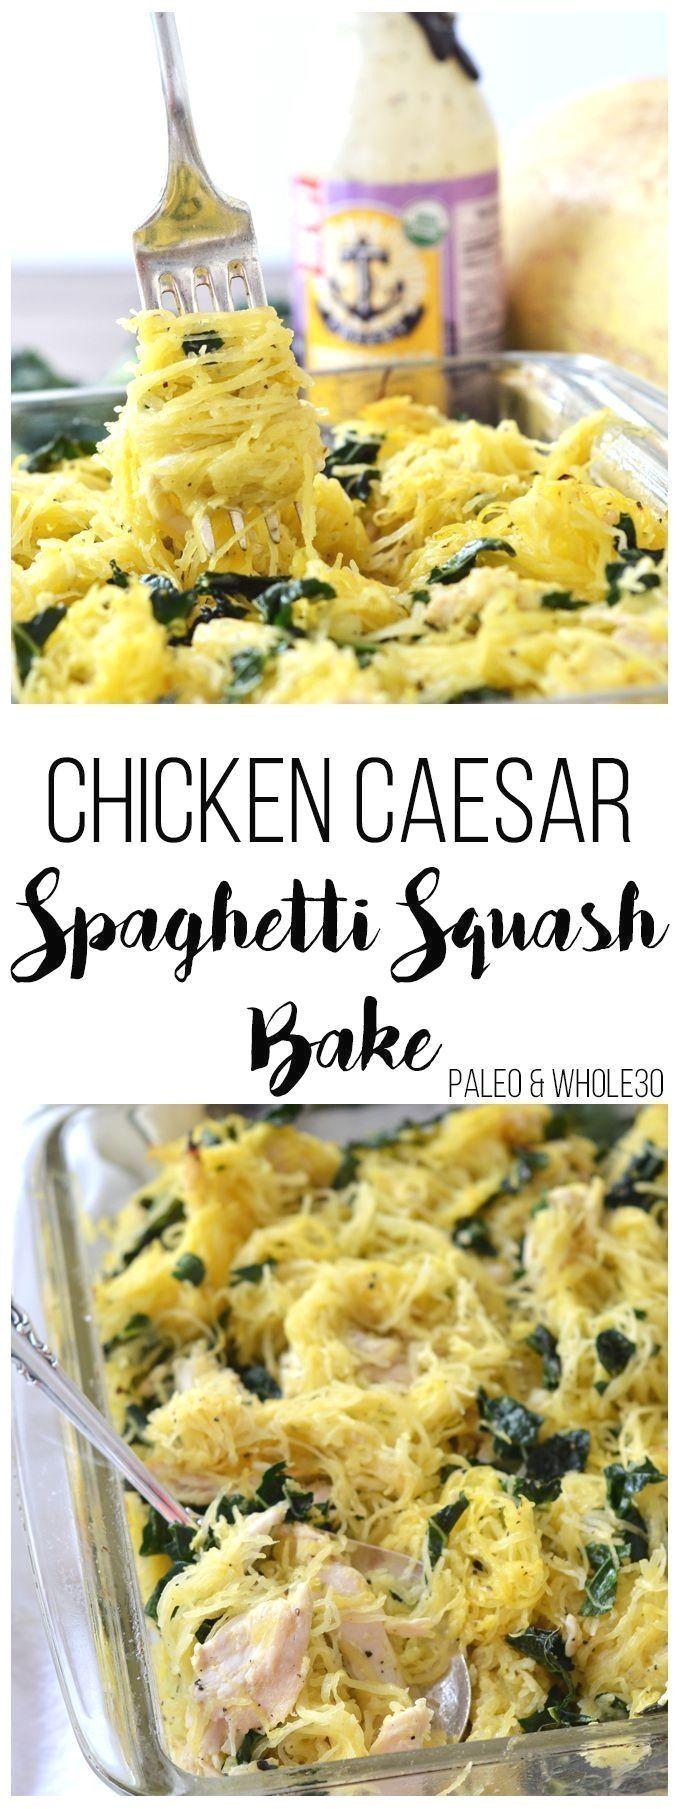 Chicken Caesar Spaghetti Squash Bake images